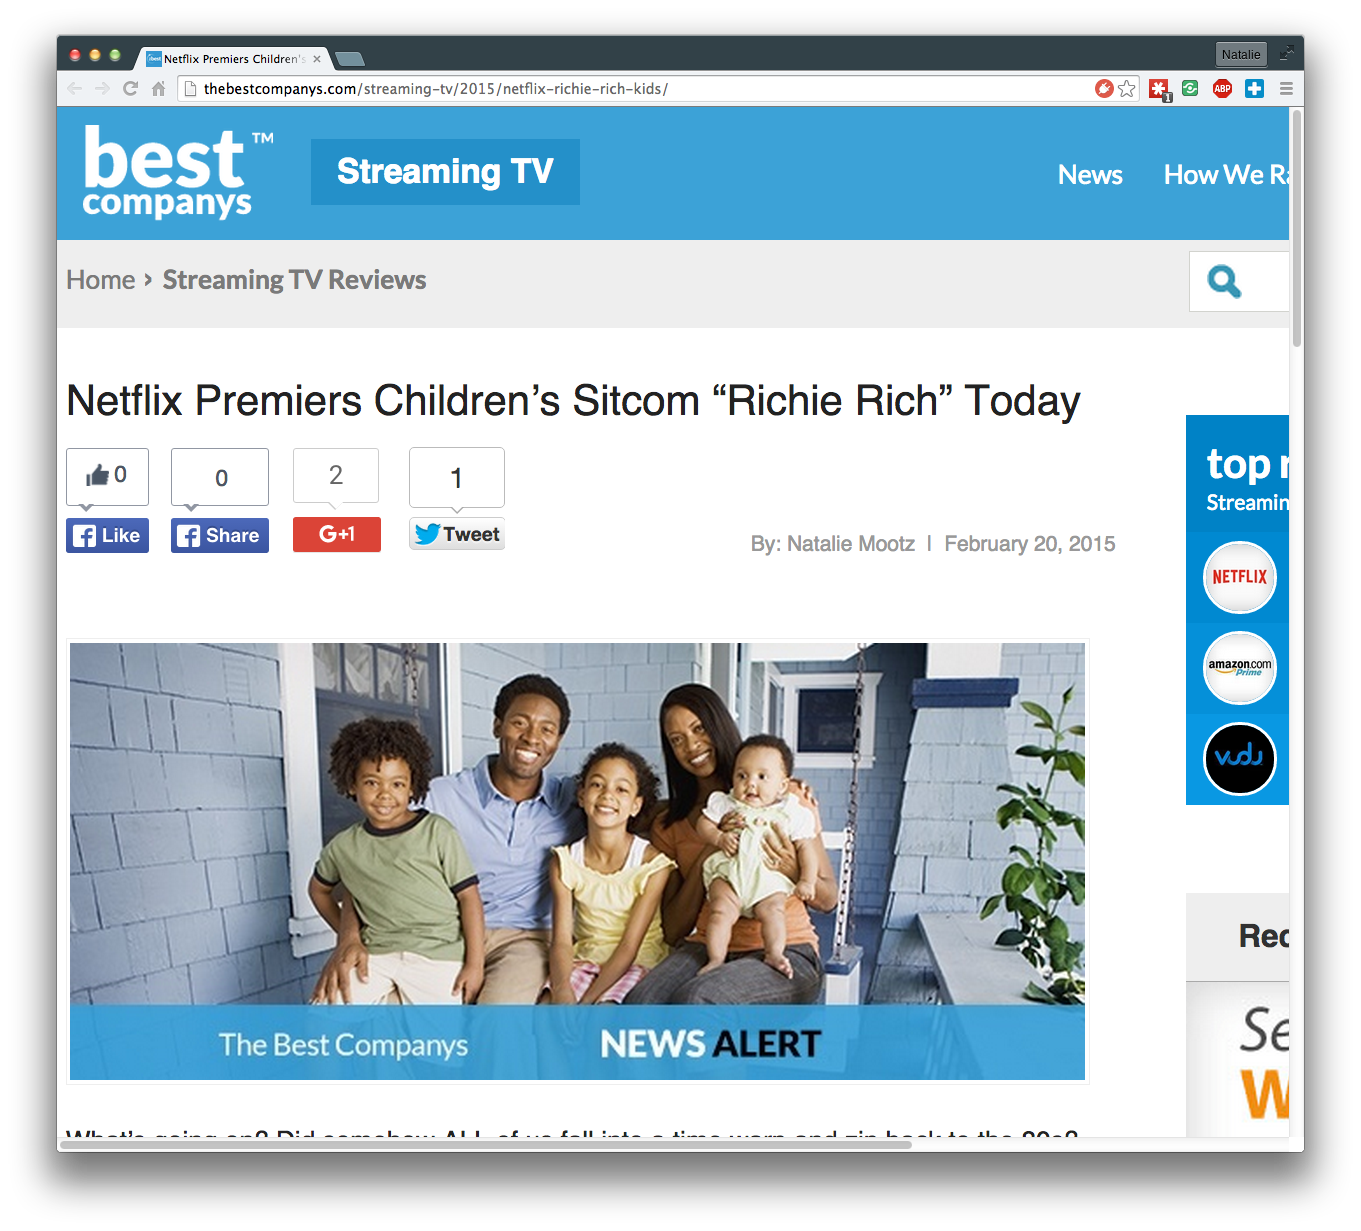 Netflix Premiers Children's Sitcom Richie Rich Today